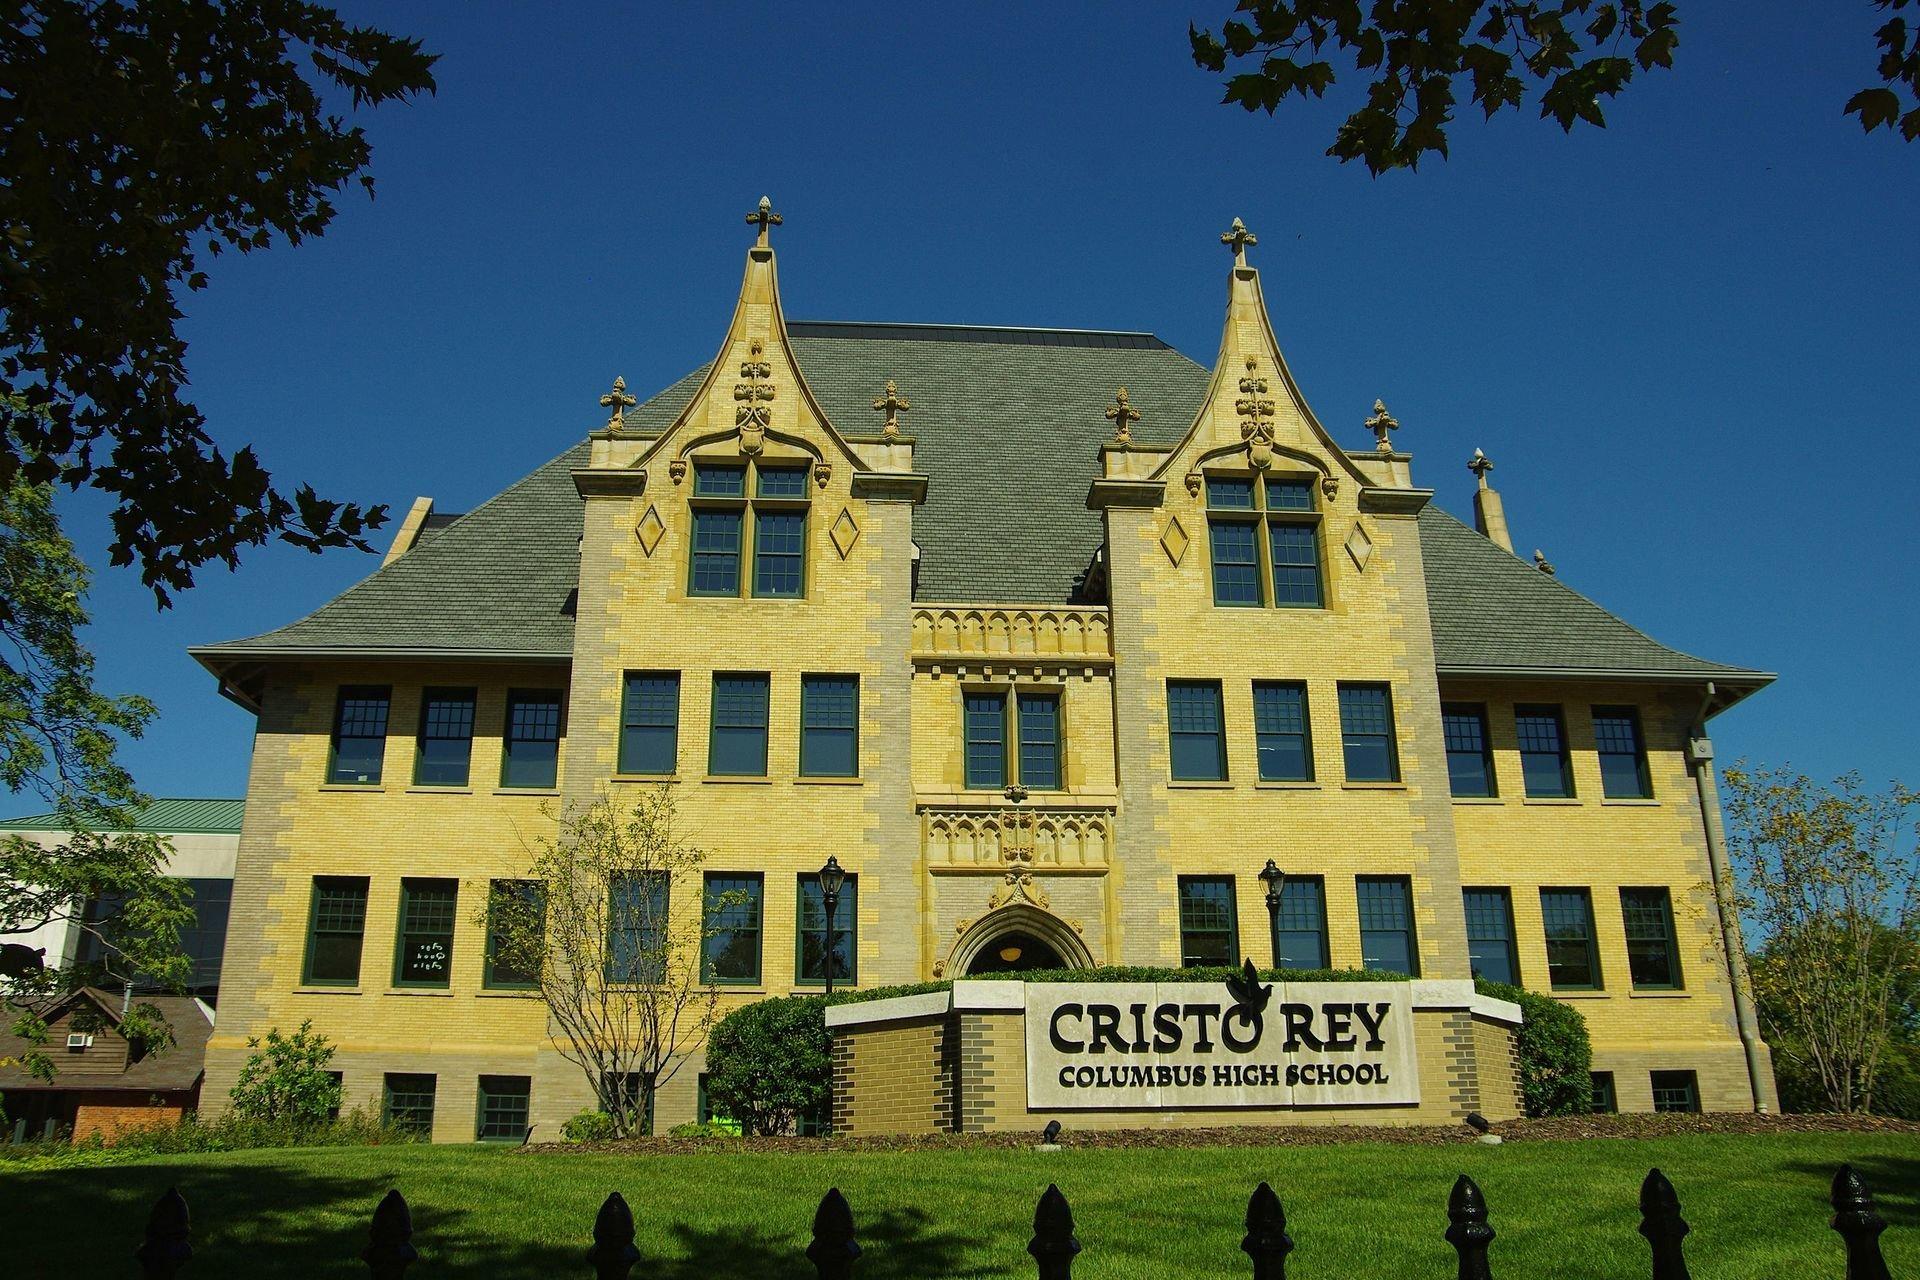 Cristo Rey Columbus High School, Ohio